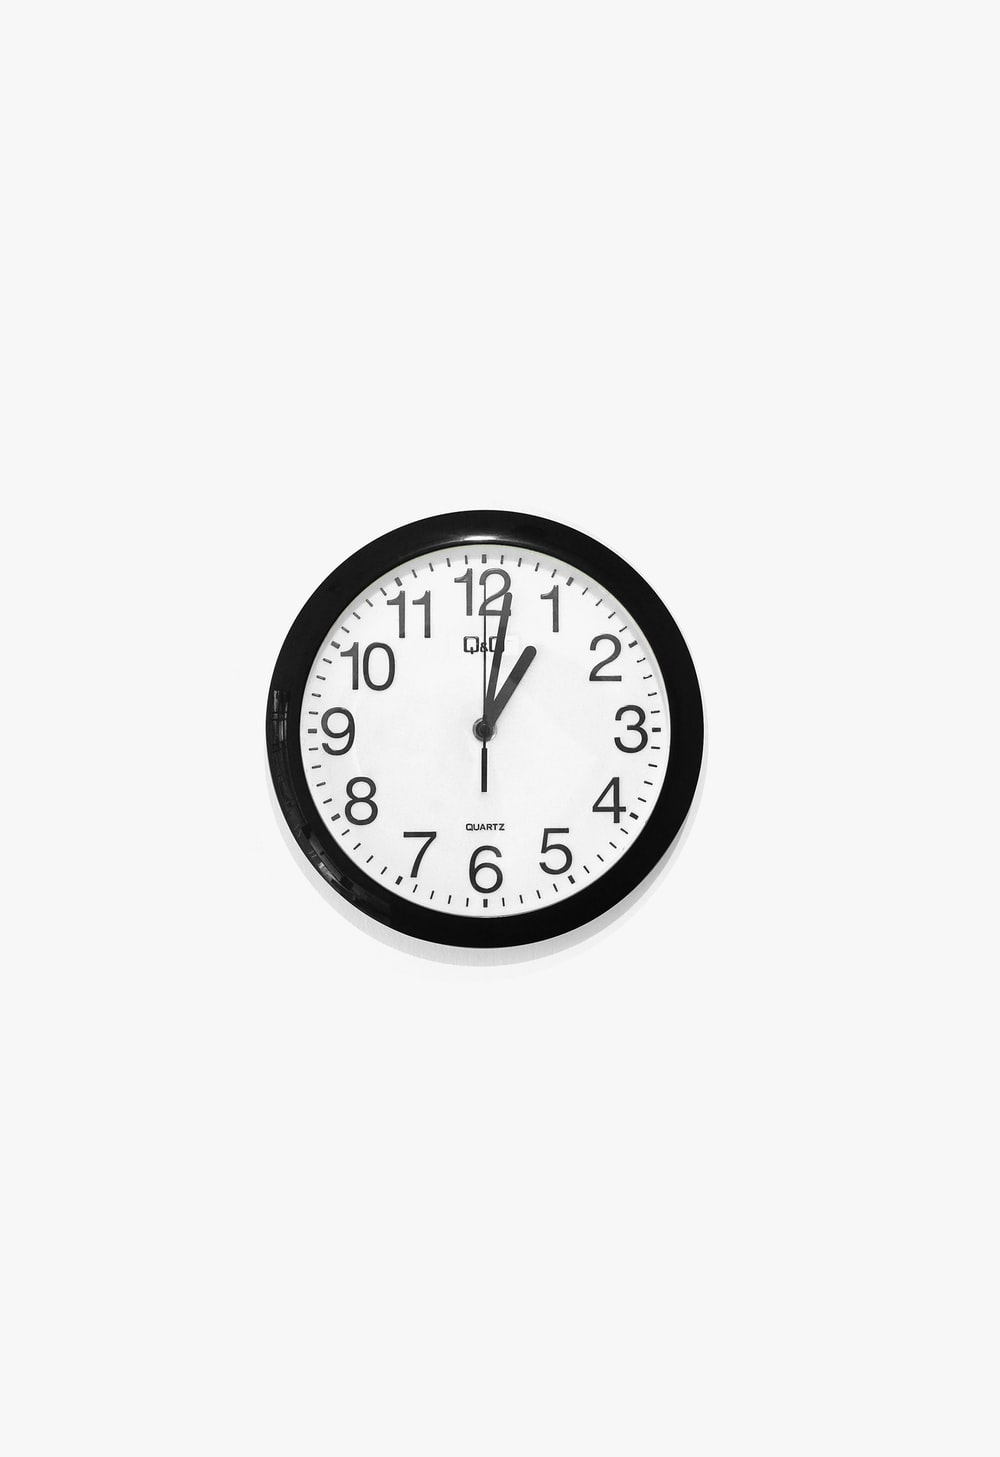 black and white round analog wall clock at 10 10